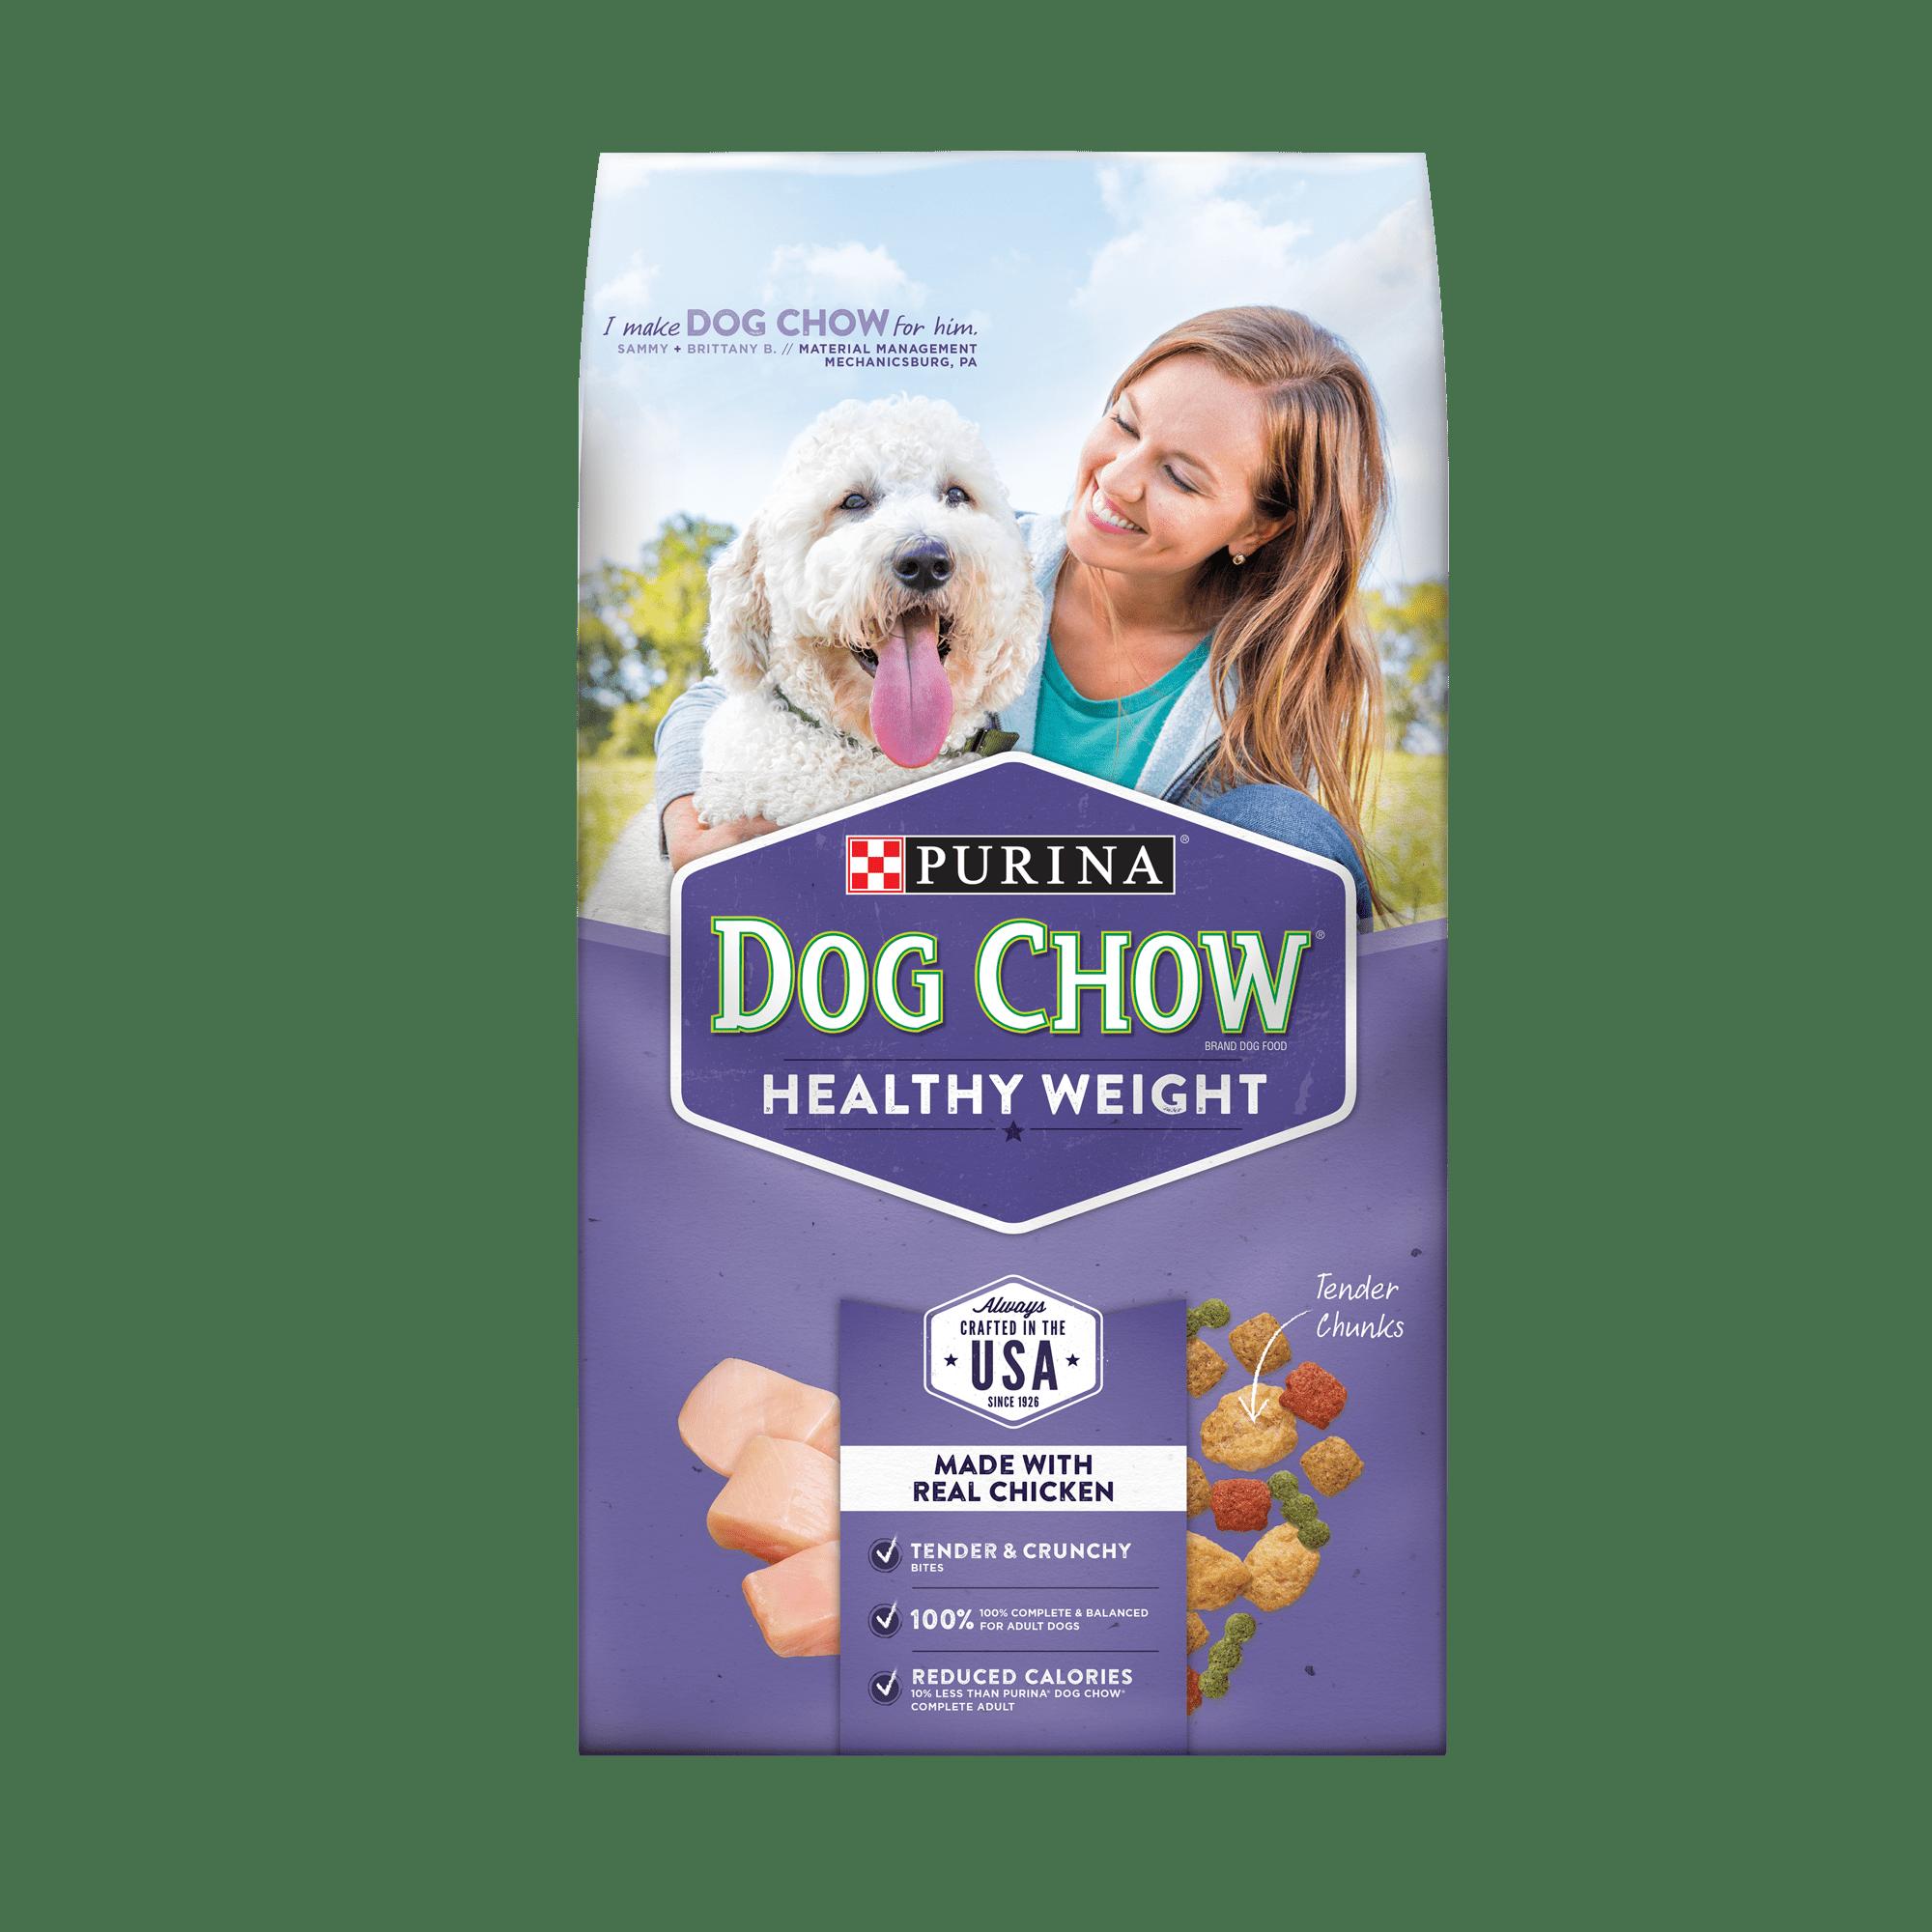 Purina Dog Chow Healthy Weight Adult Dry Dog Food - 4 lb. Bag